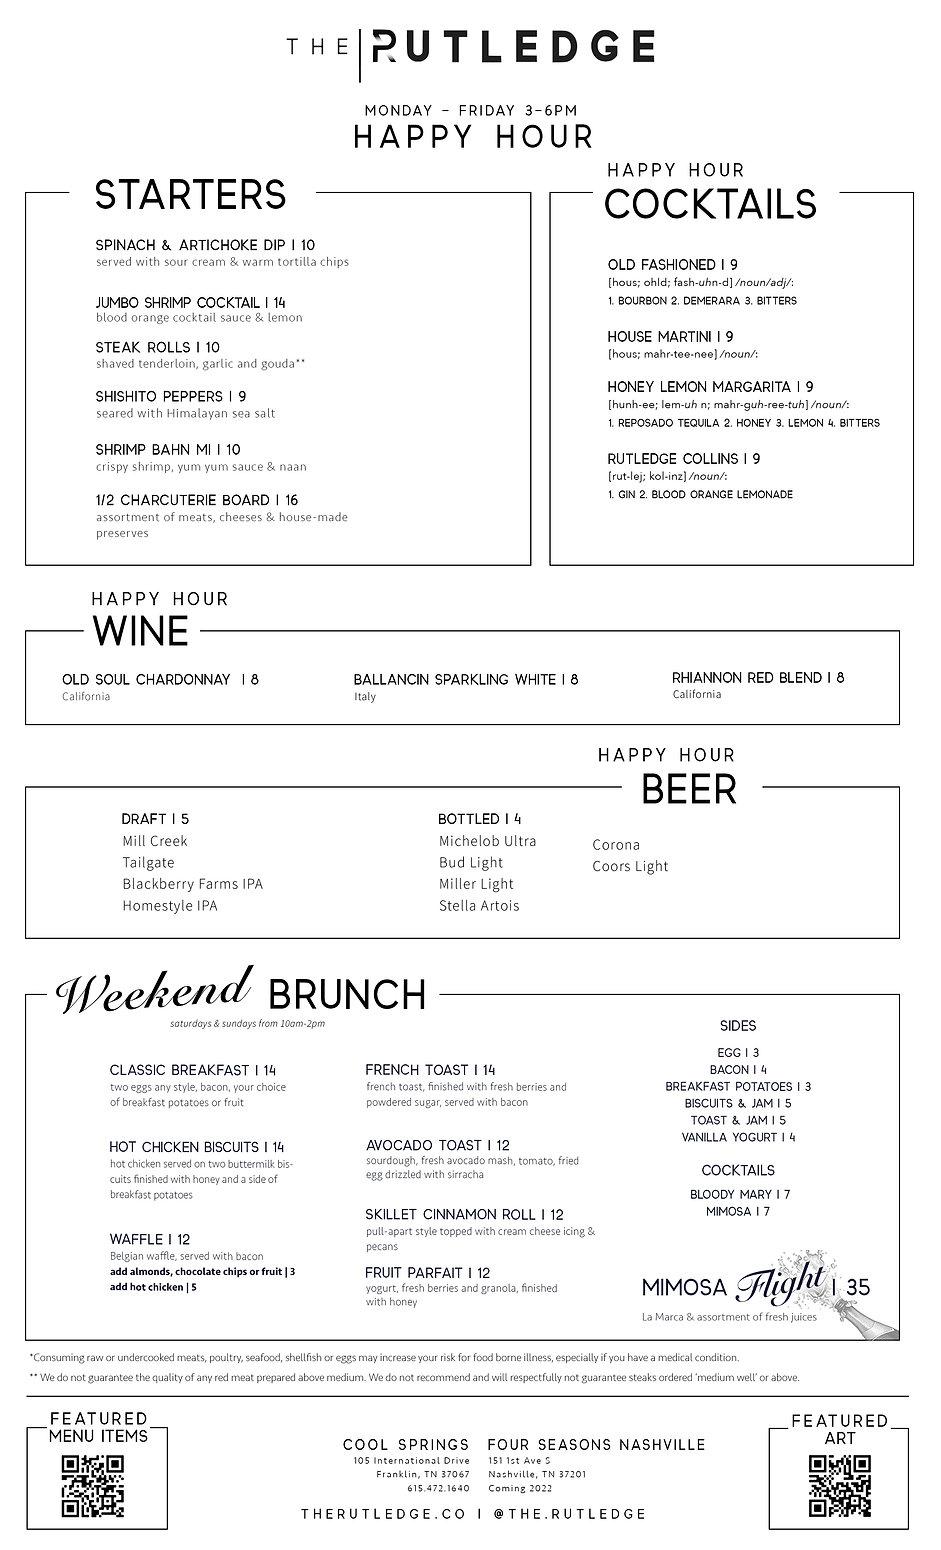 Rutledge new menu back Condensed 7.23.21.jpg